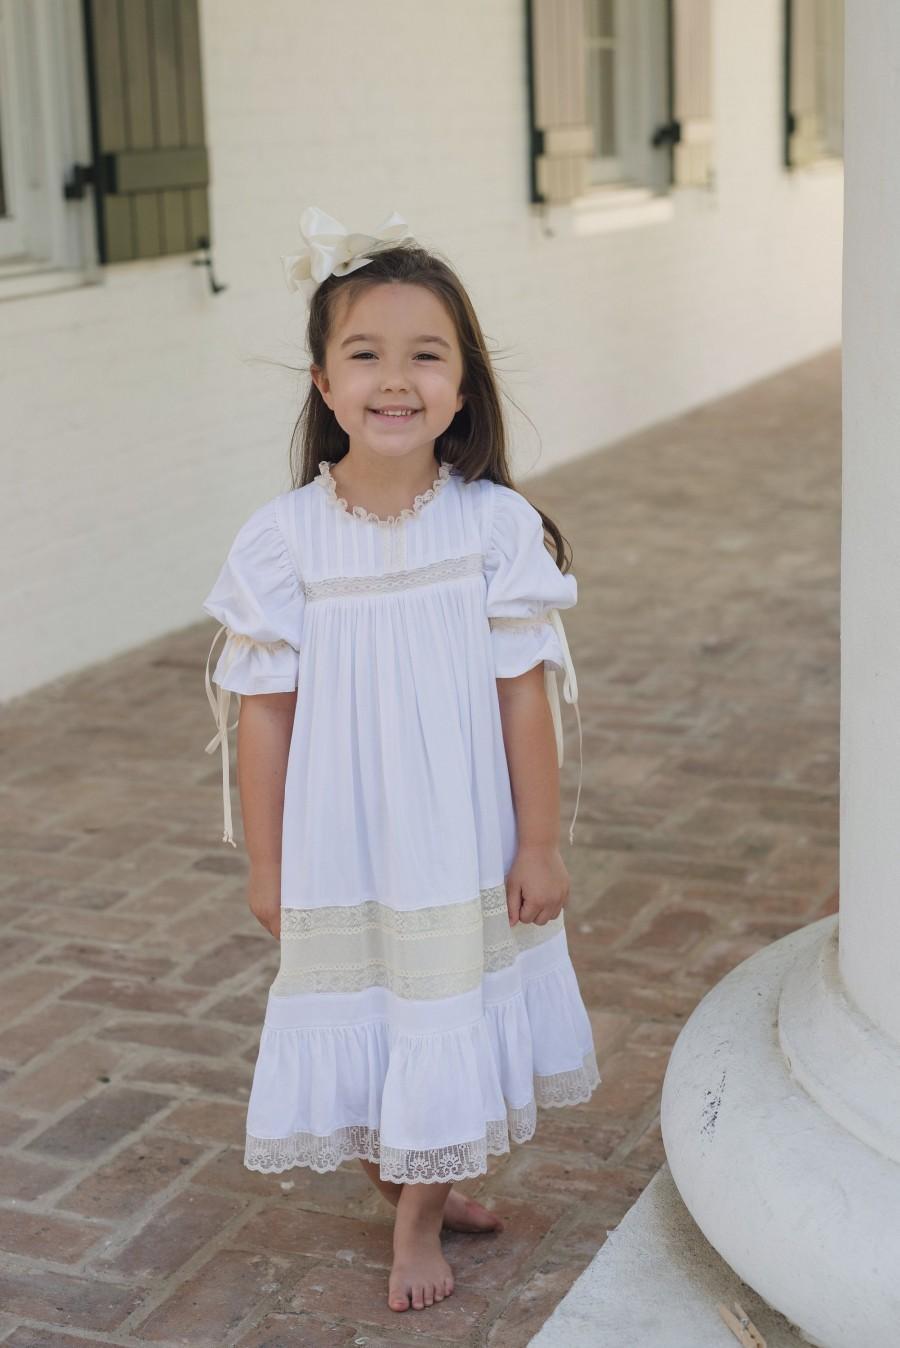 Wedding - White/Ecru Heirloom Dress